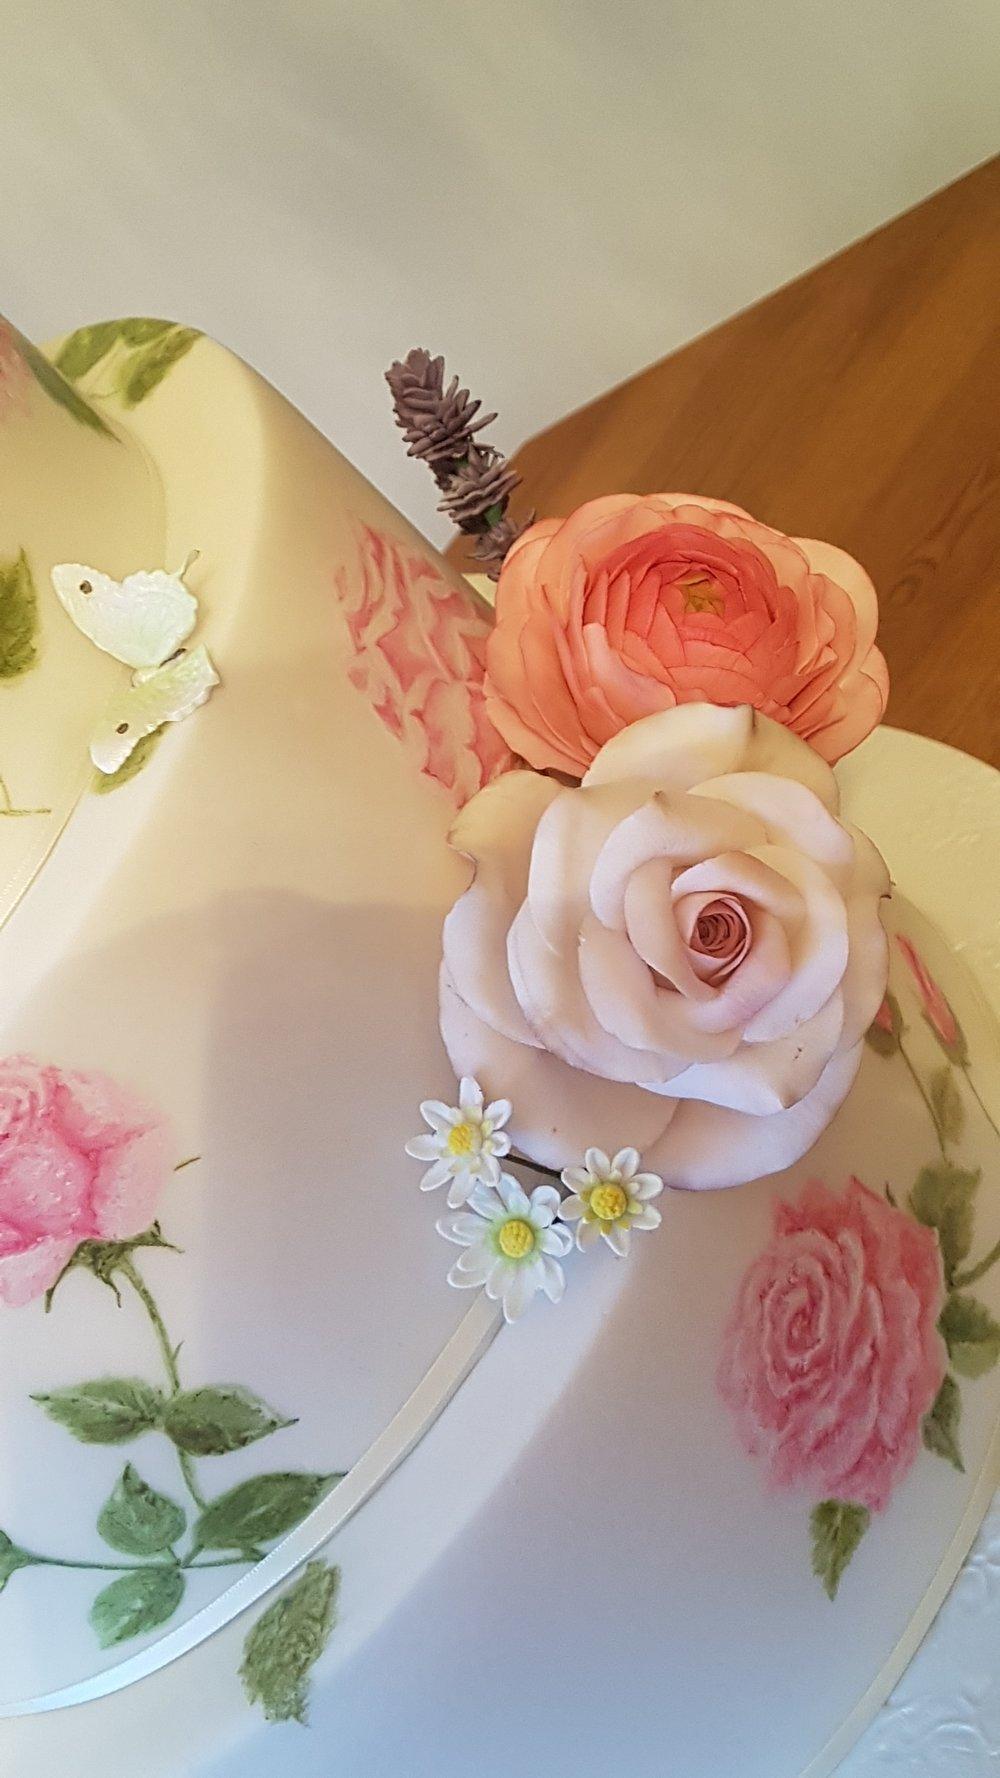 Rose Garden, sugar Daisy, Rose, Ranunculus, Lavender